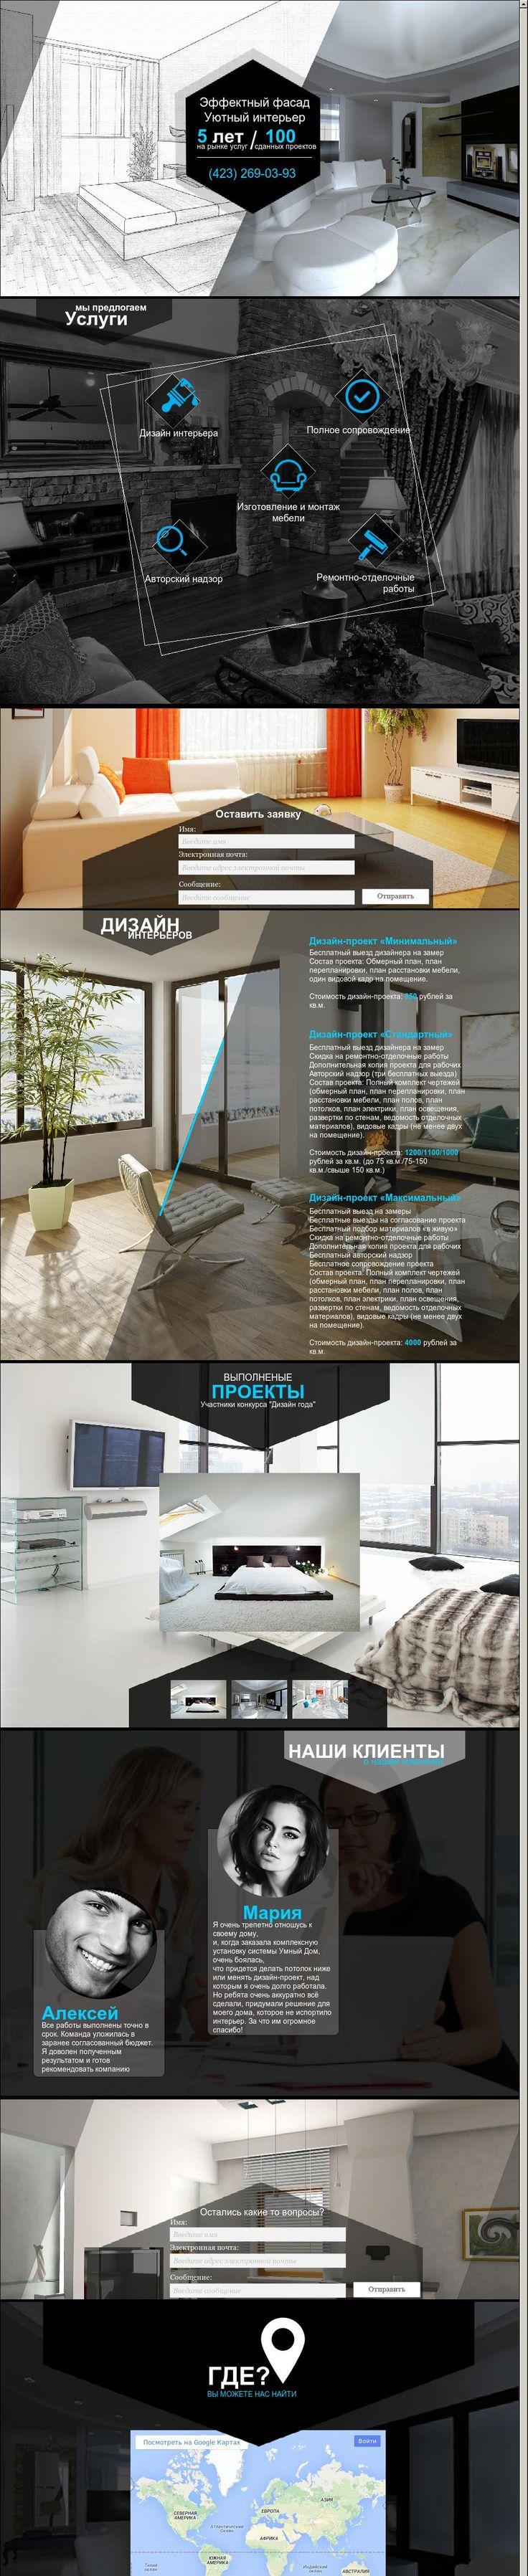 my job web design Дизайн my job web design and my job web design